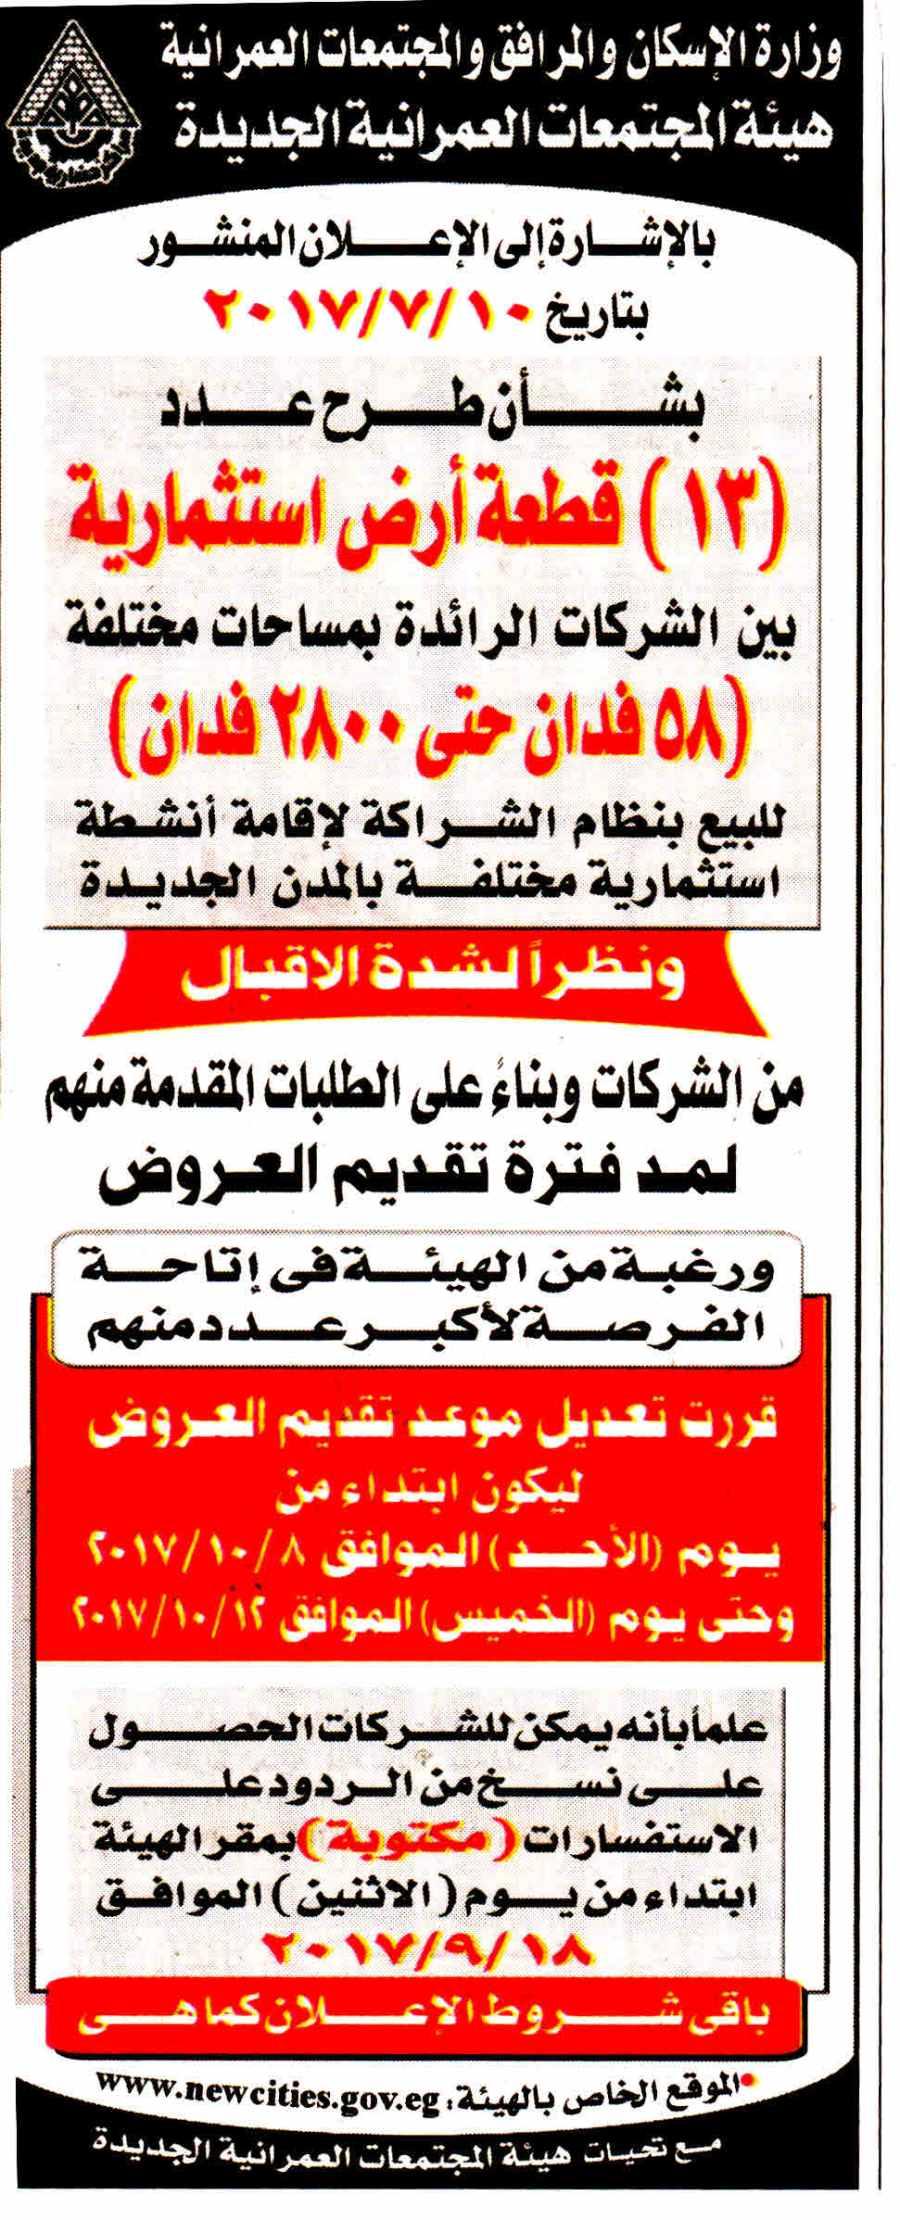 Al Akhbar 13 Sep P.1.jpg